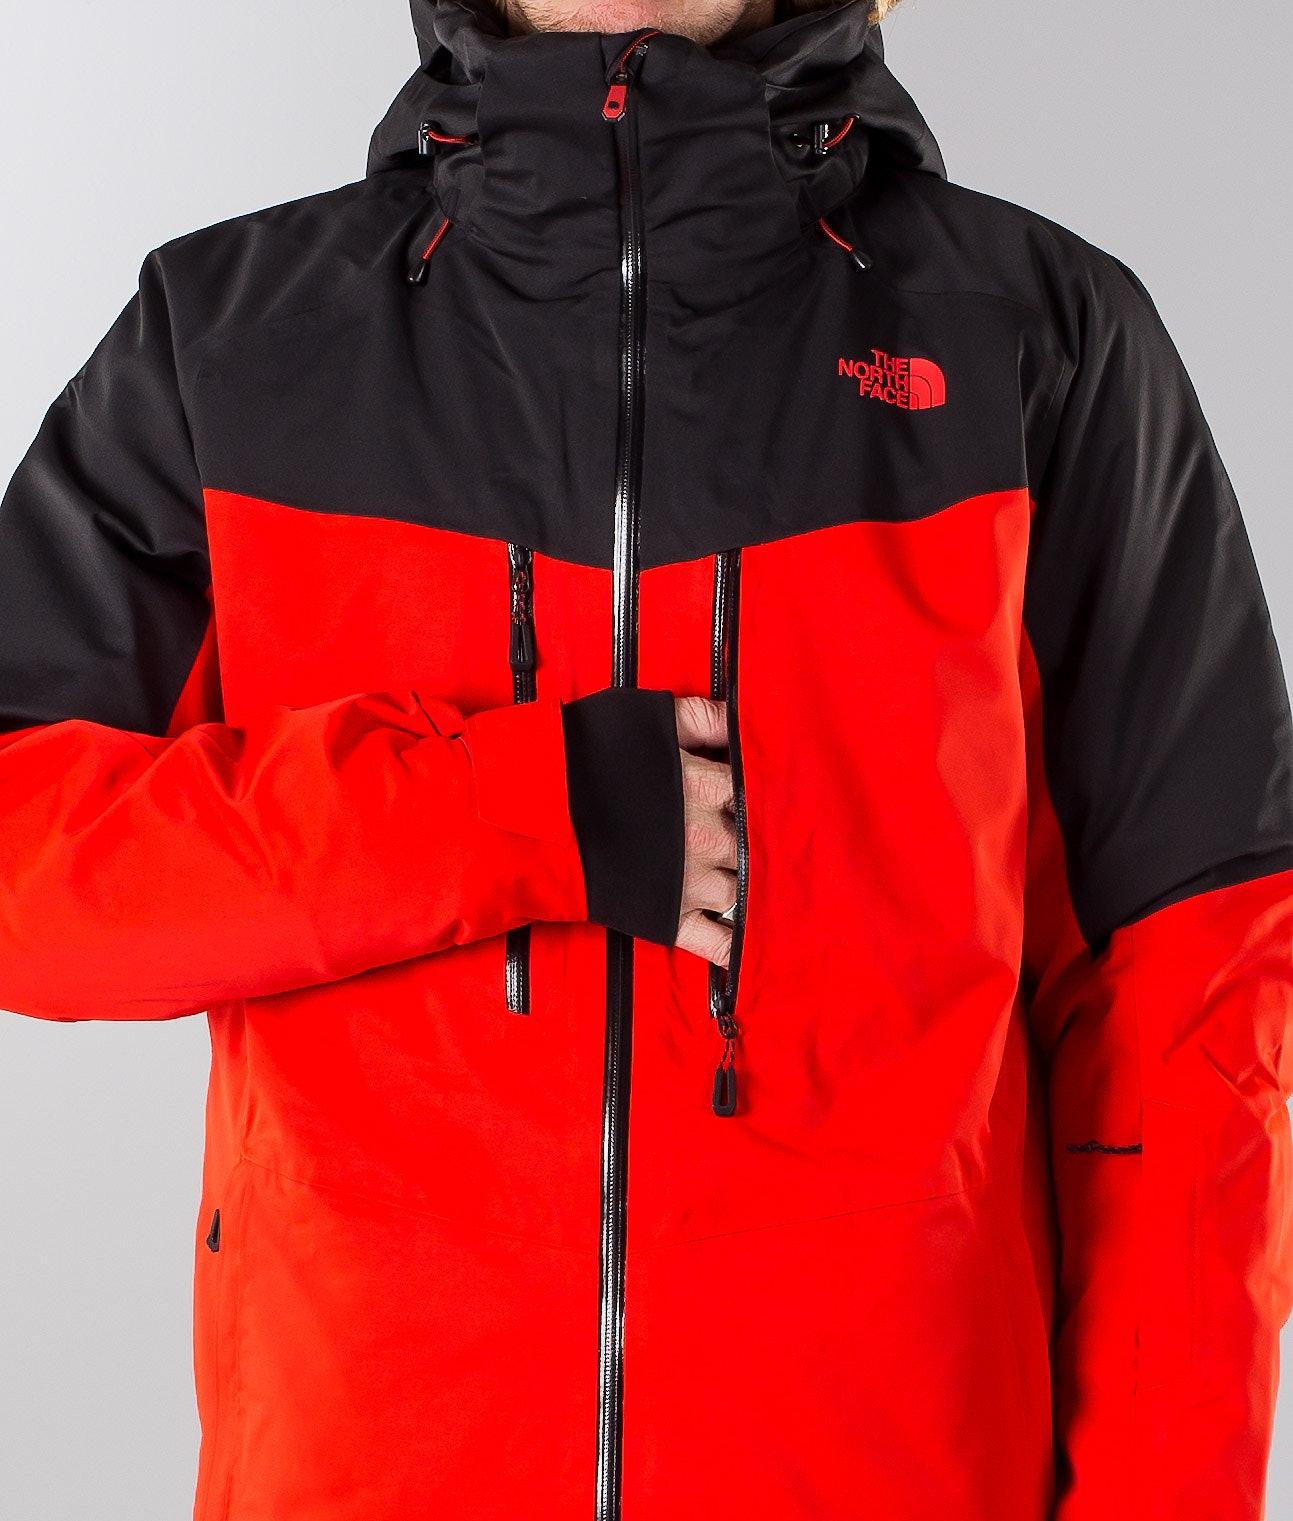 83618828f The North Face Chakal Ski Jacket Red/Black - Ridestore.com